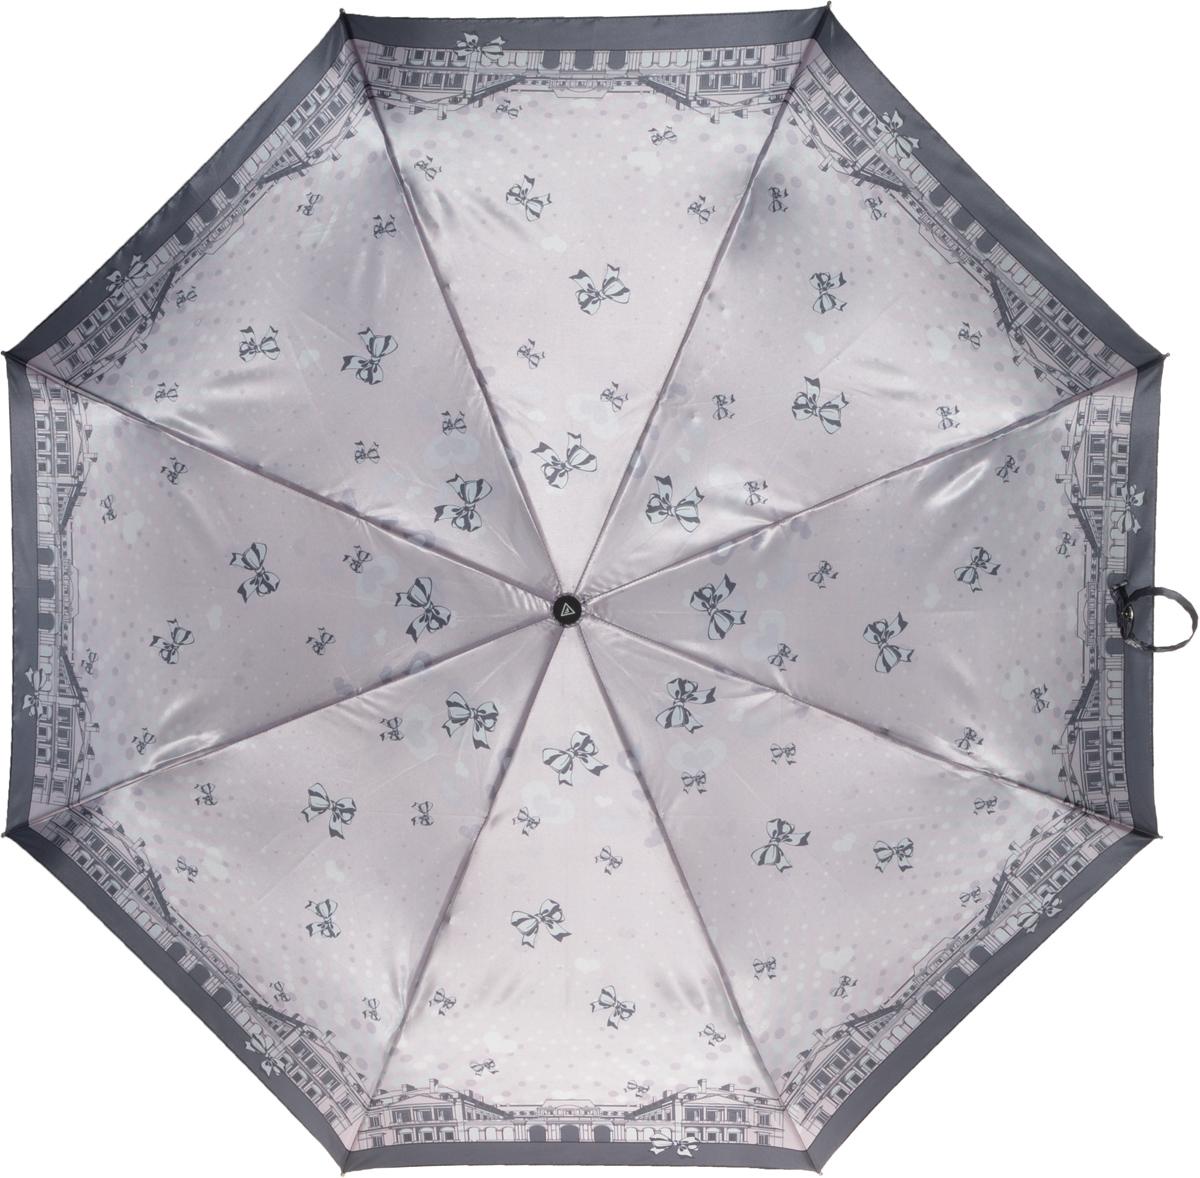 Зонт женский Fabretti, автомат, 3 сложения. L-16104-15L-16104-15Зонт женский Fabretti, облегченный суперавтомат, 3 сложения